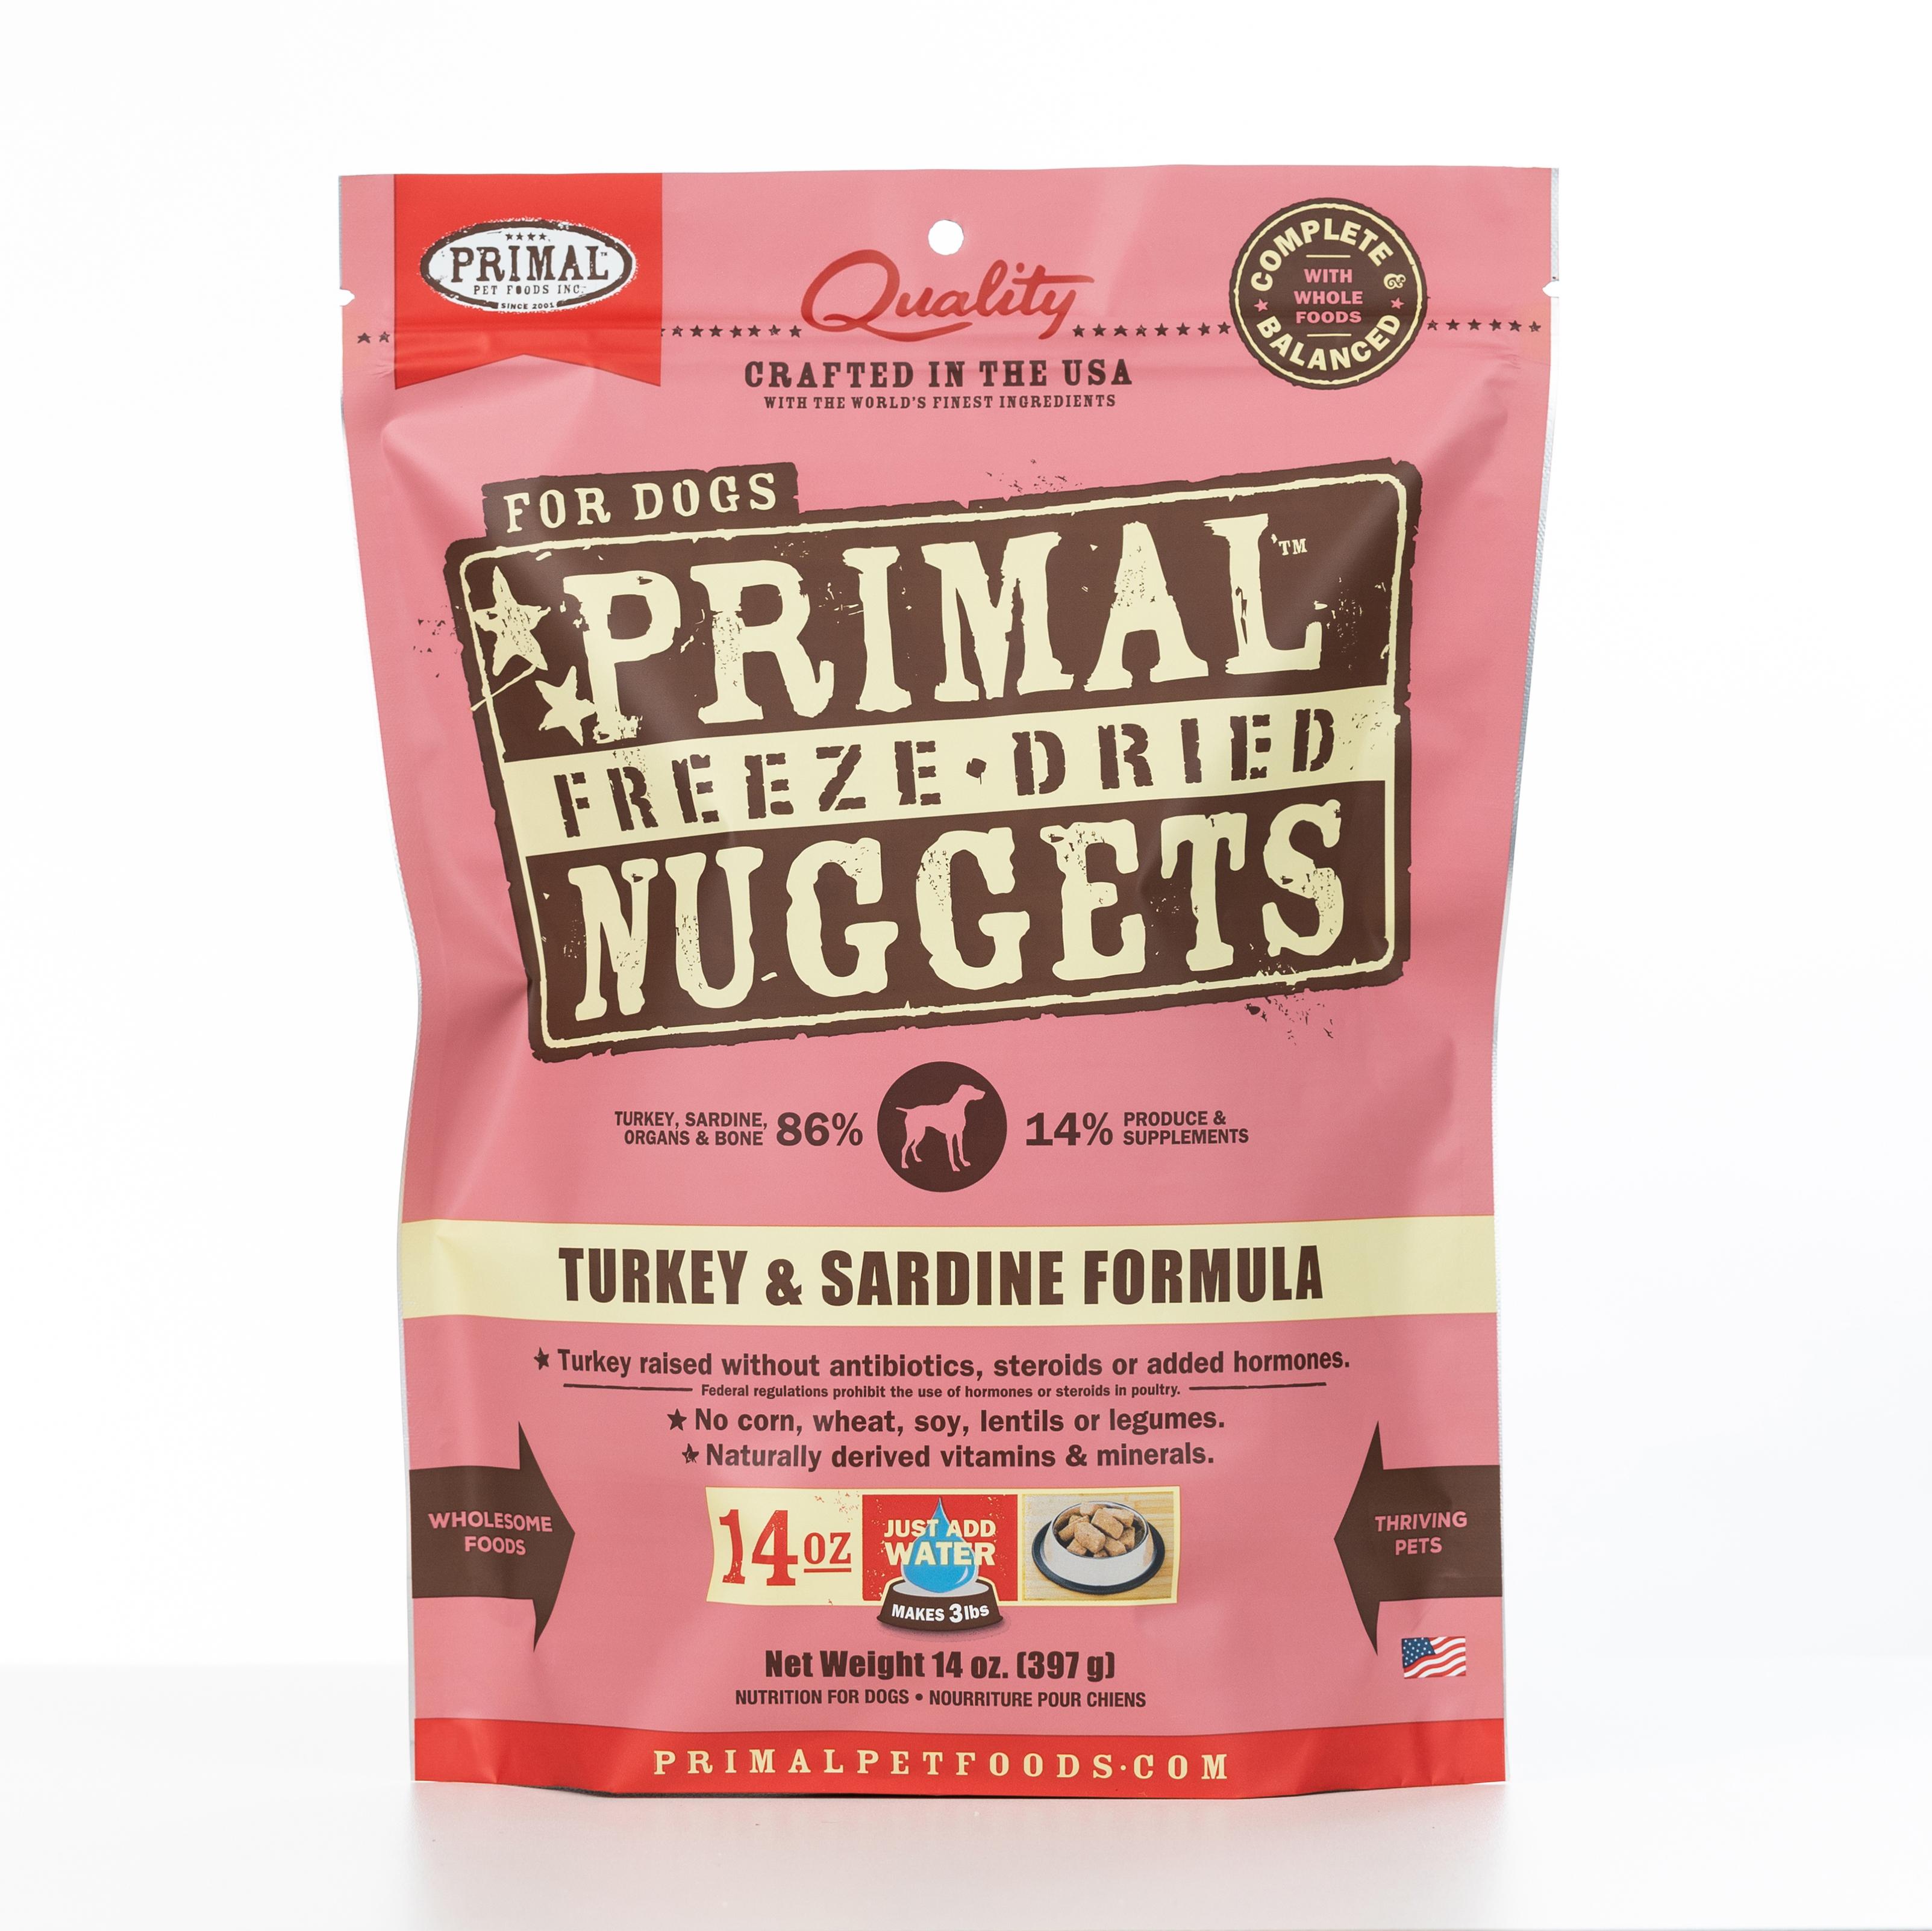 Primal Raw Freeze-Dried Nuggets Turkey & Sardine Formula Dog Food, 14-oz bag, case of 4